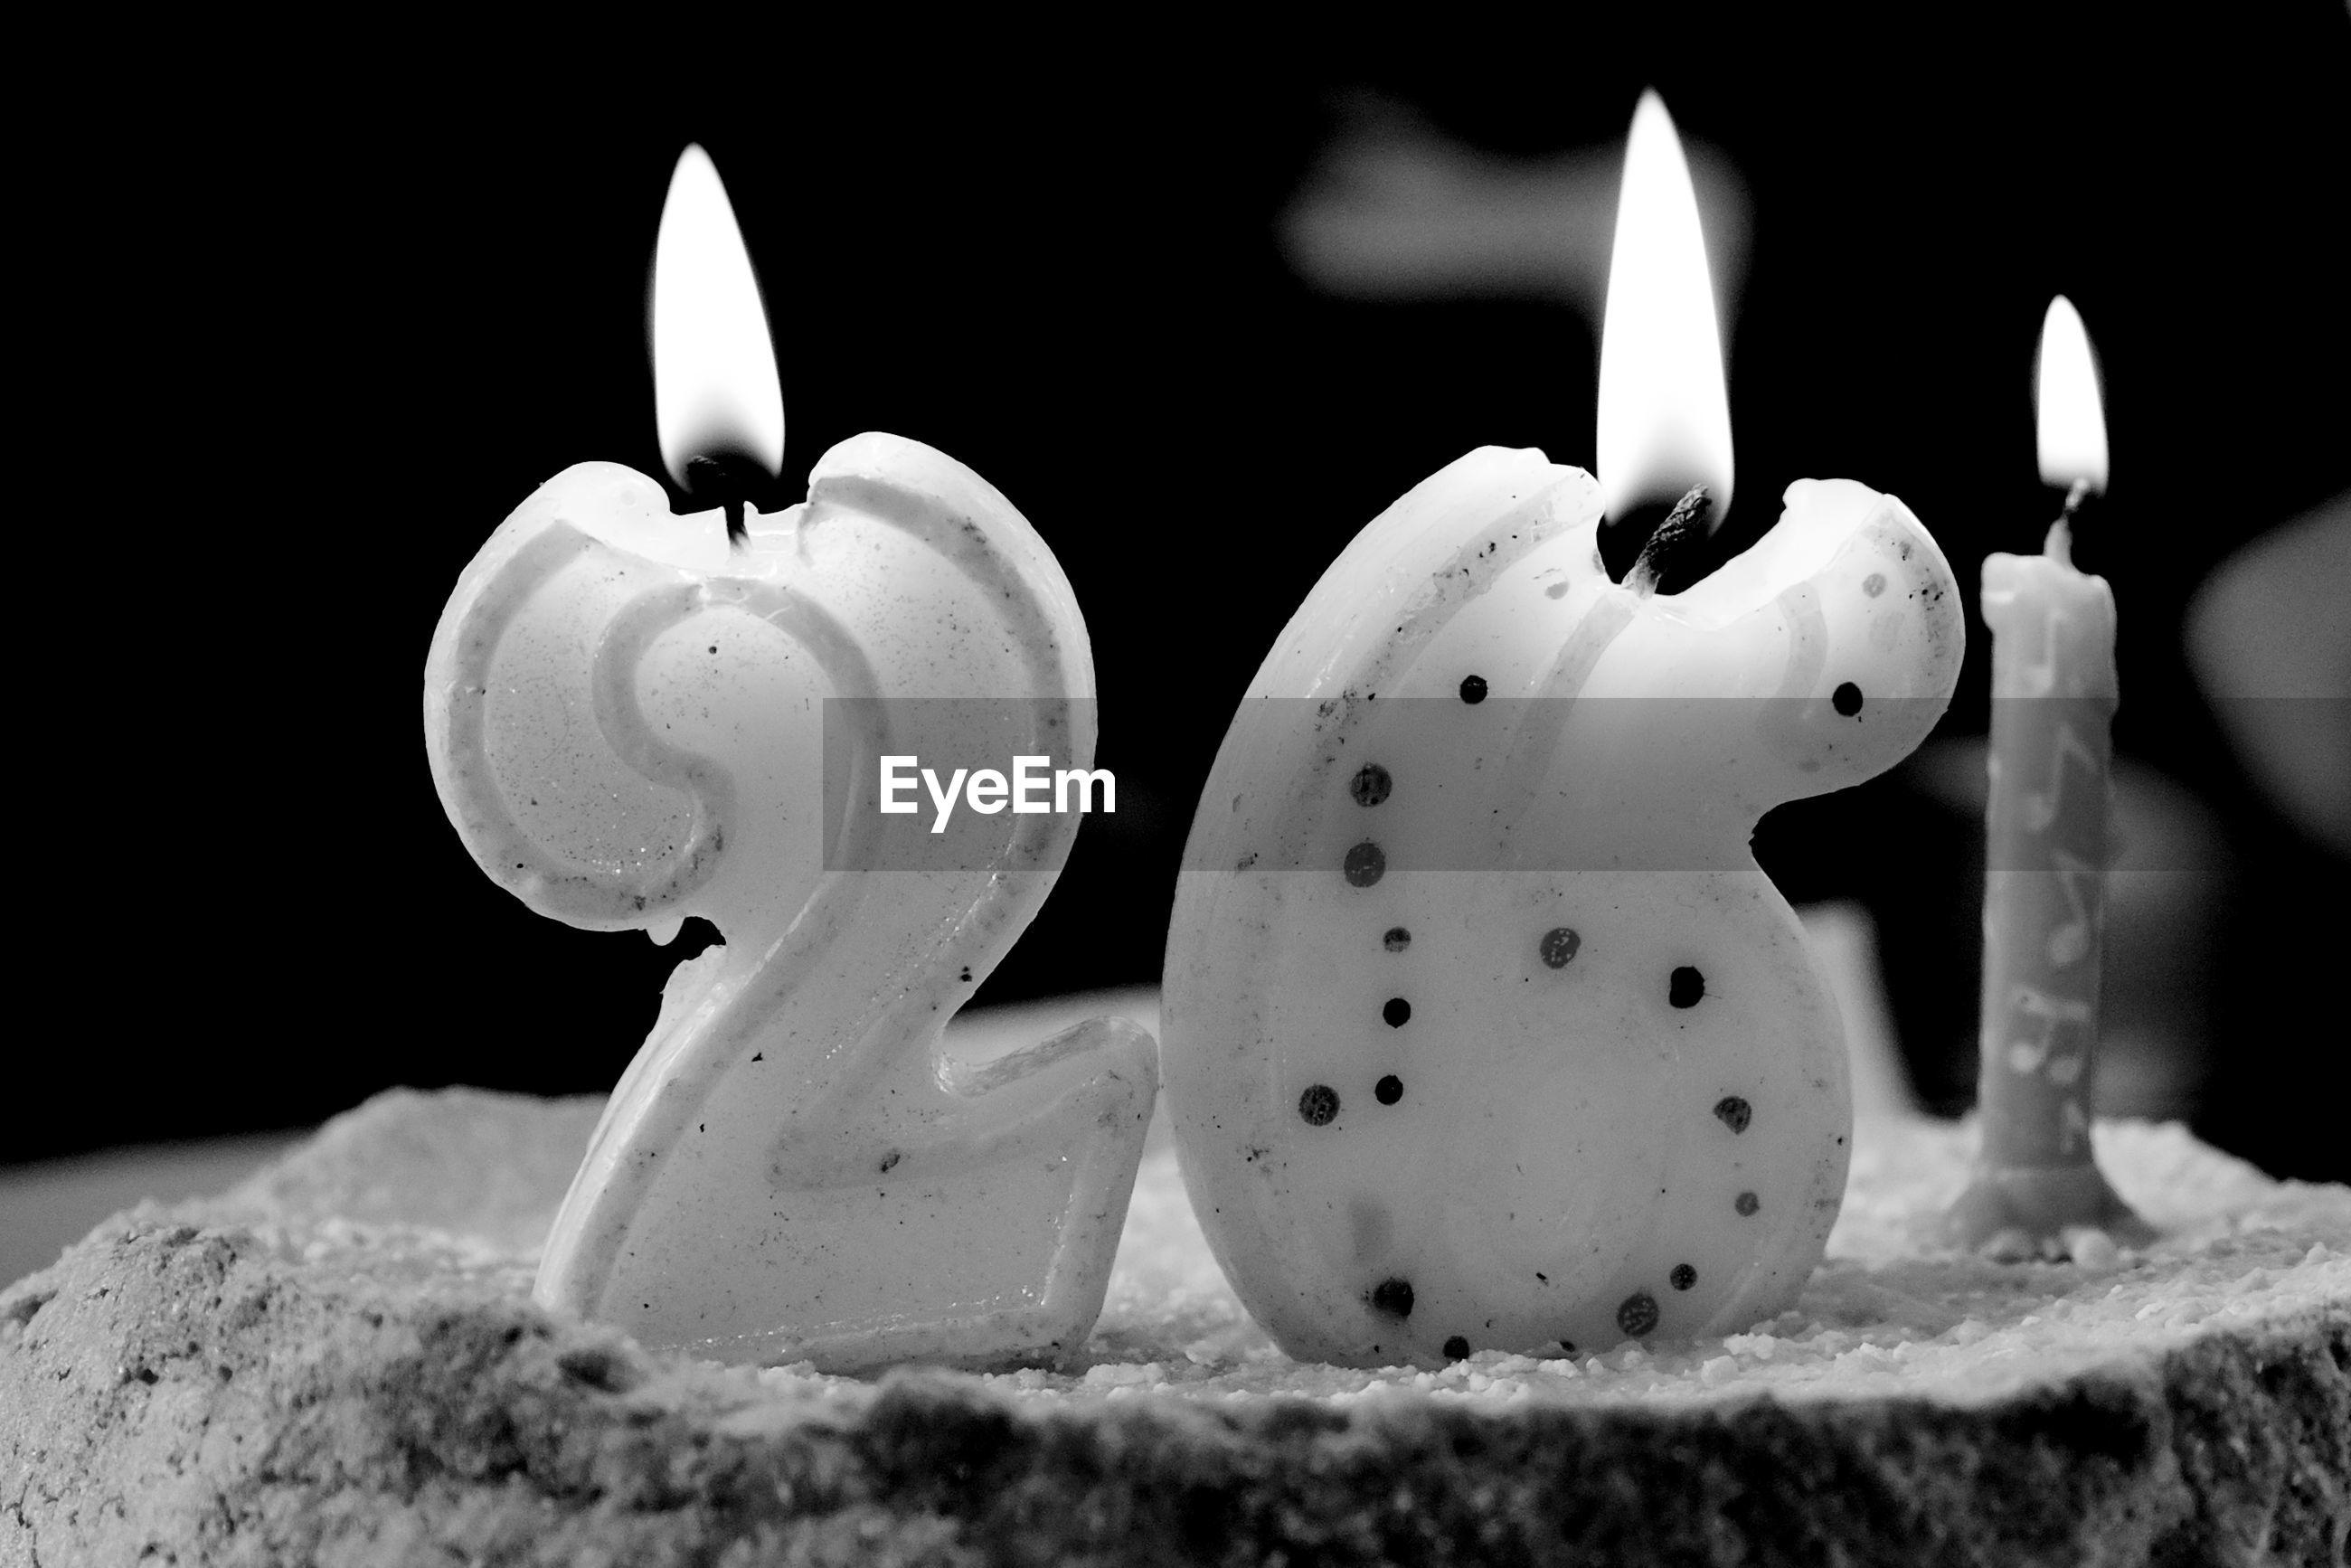 flame, candle, burning, heat - temperature, close-up, black background, melting, no people, celebration, birthday candles, birthday cake